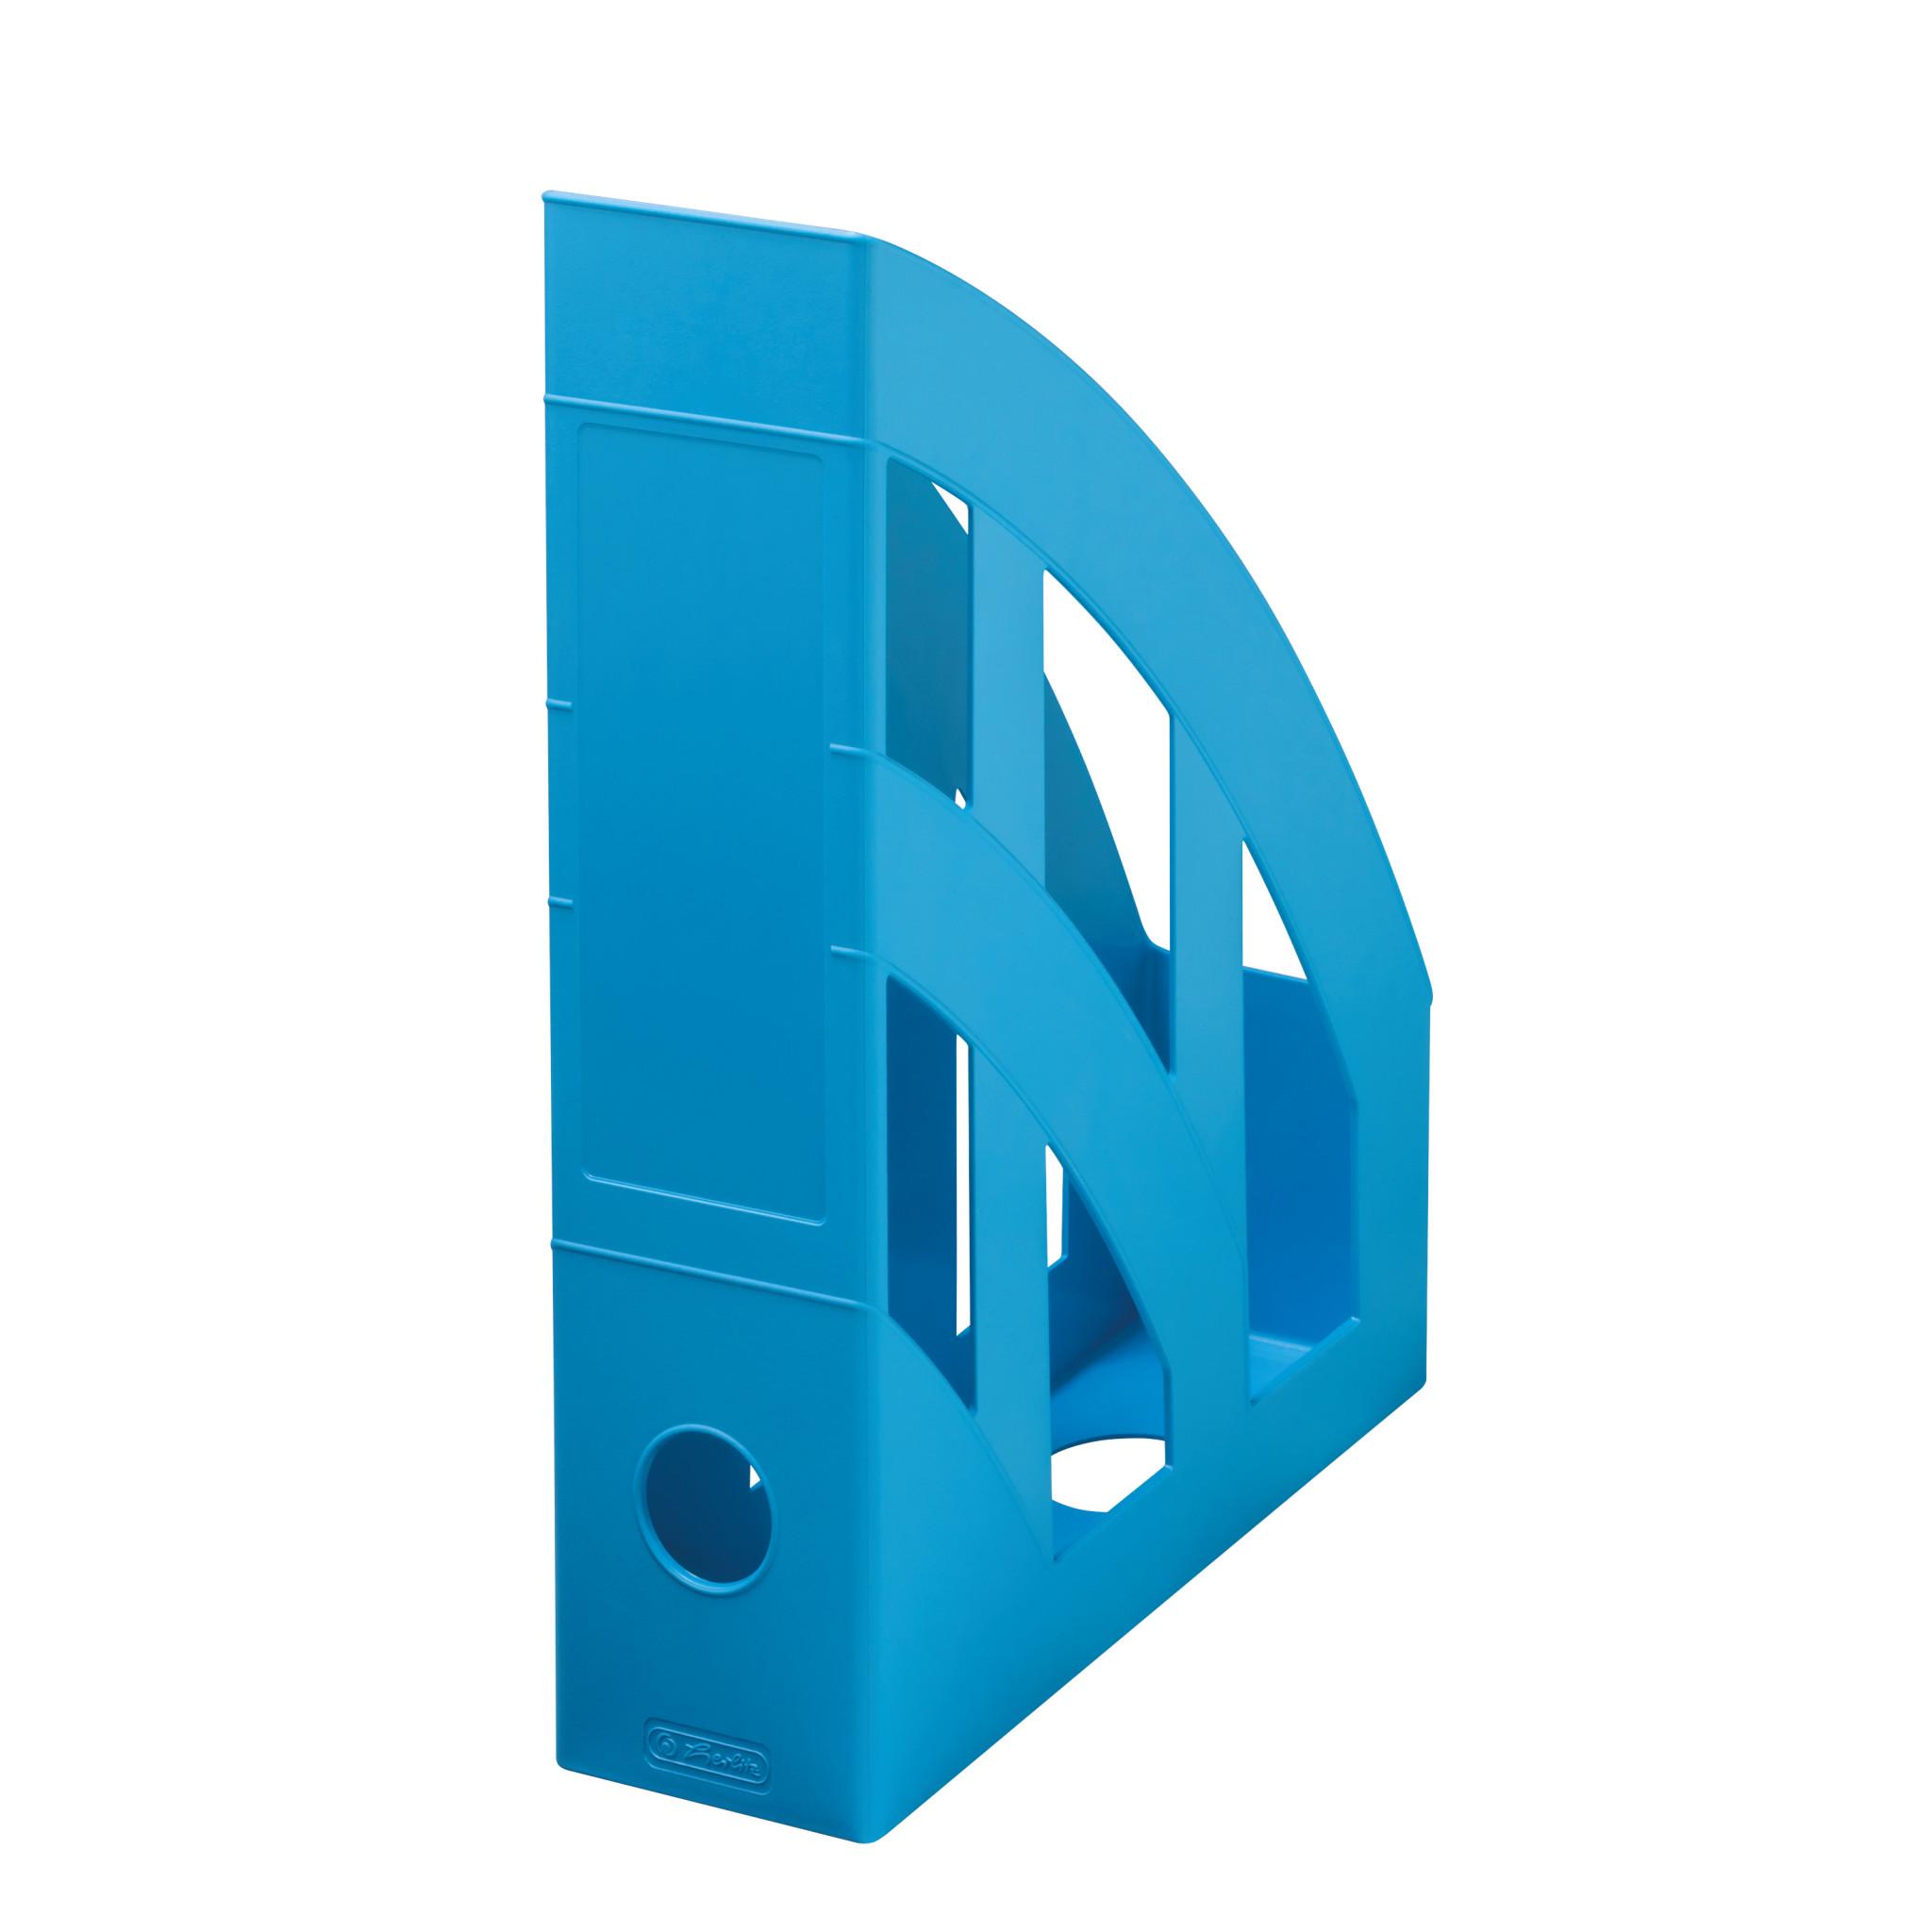 Herlitz Stehsammler A4-C4 classic recycling intensiv blau